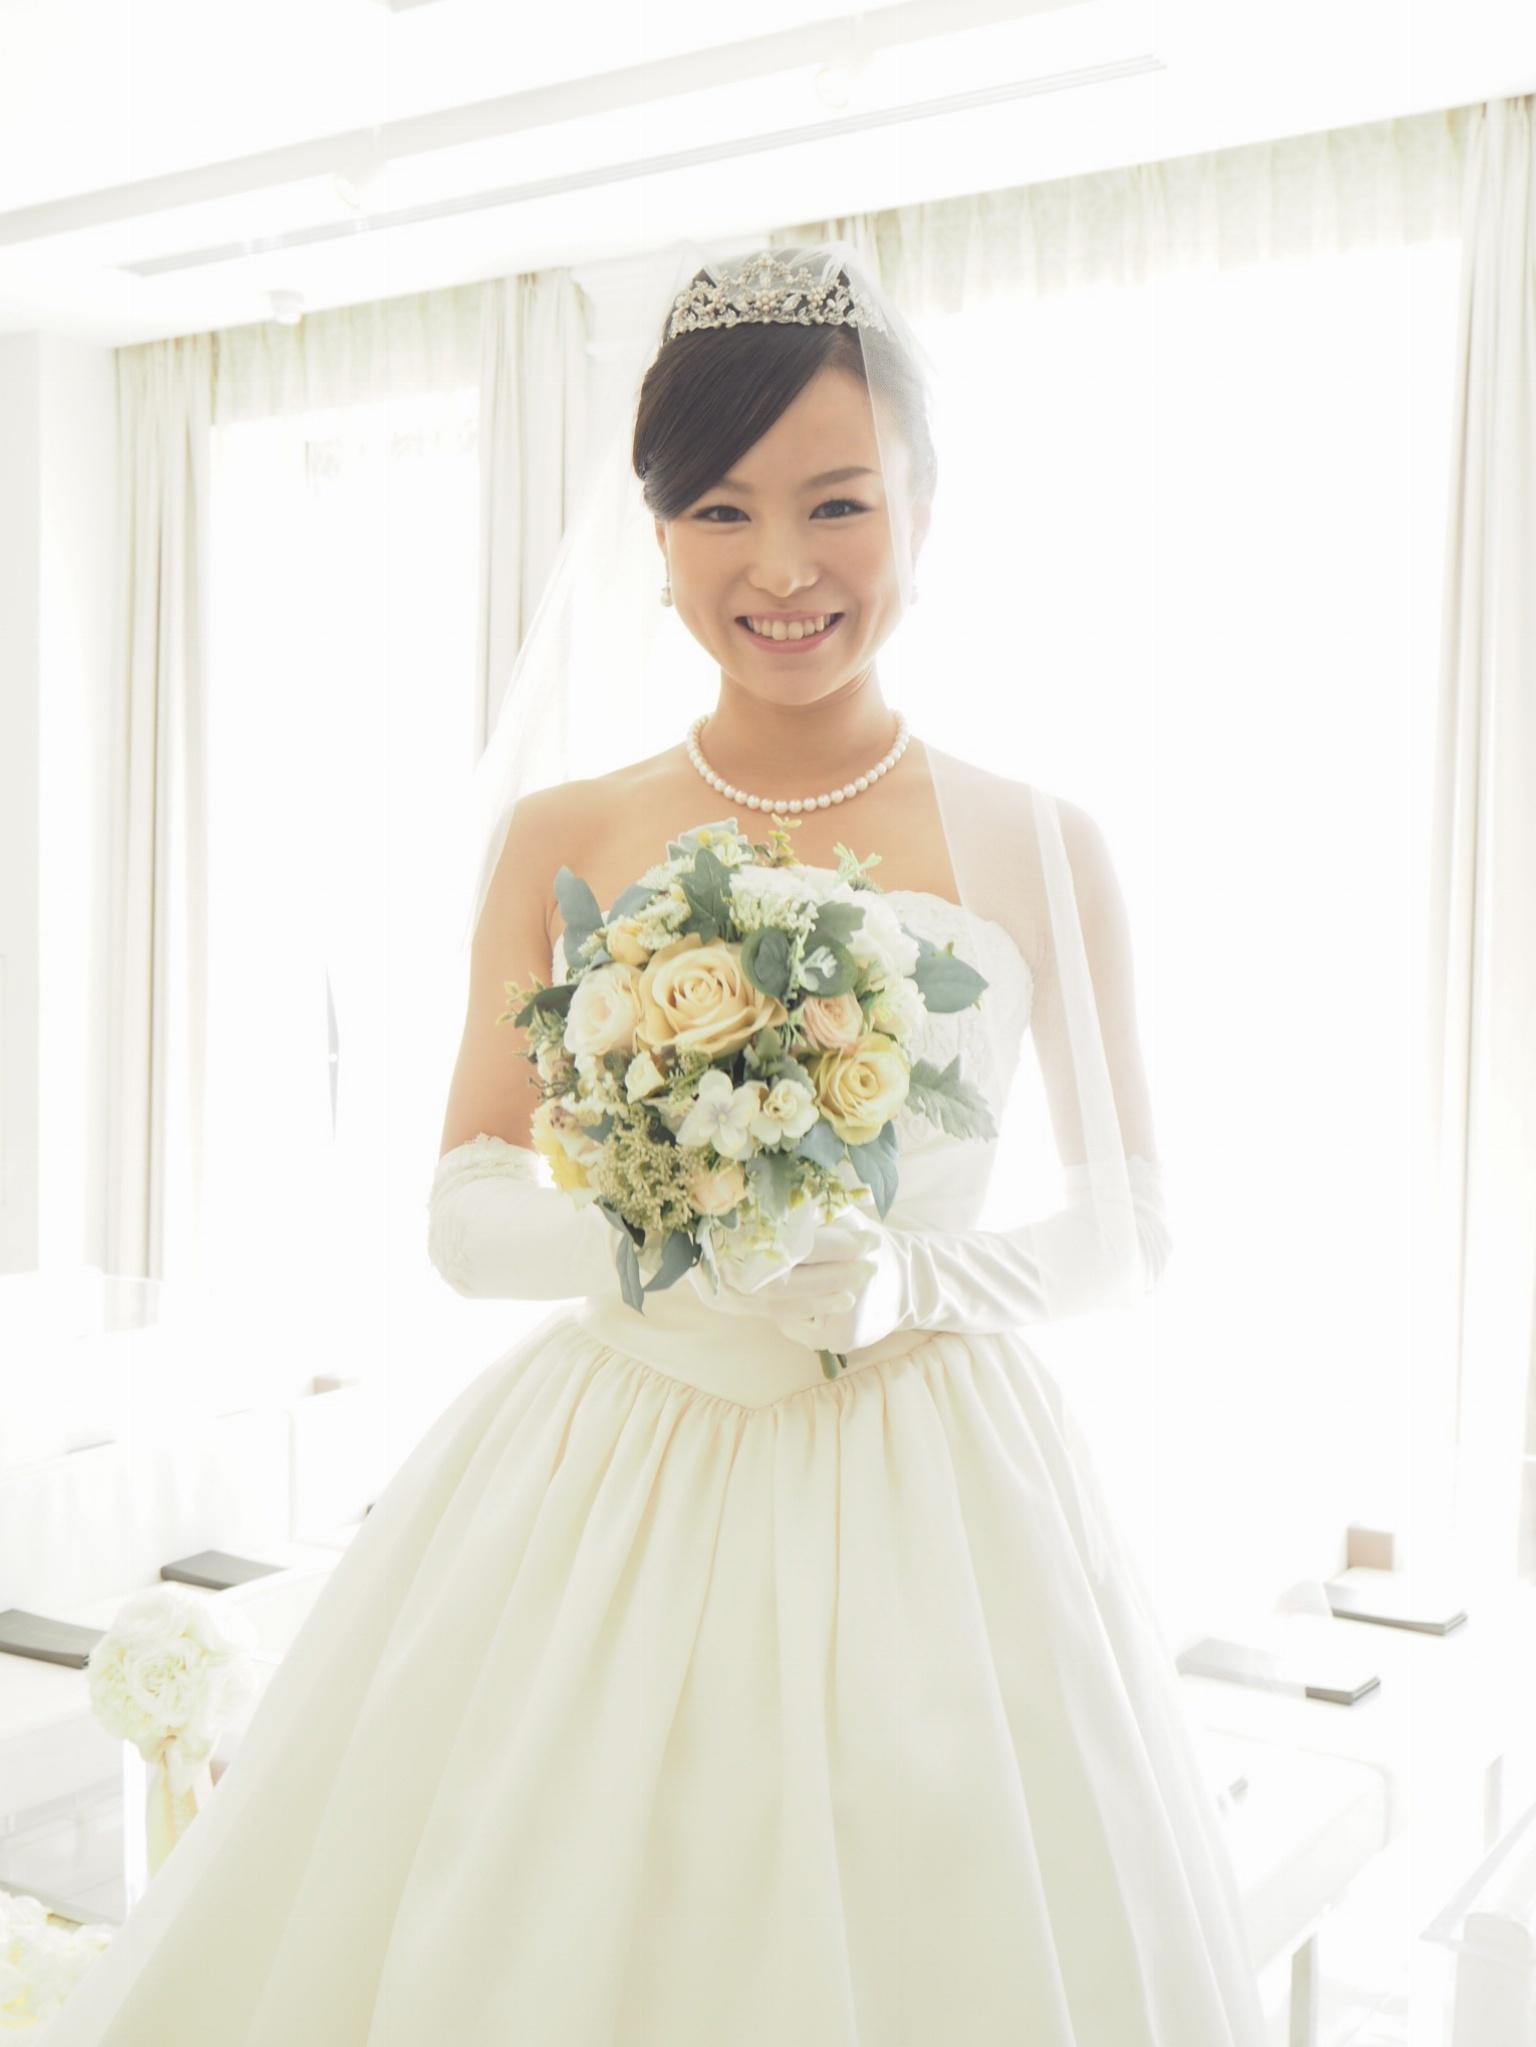 moco▶︎気持ち良い晴天の中、結婚式終了!まずはご報告まで。_1